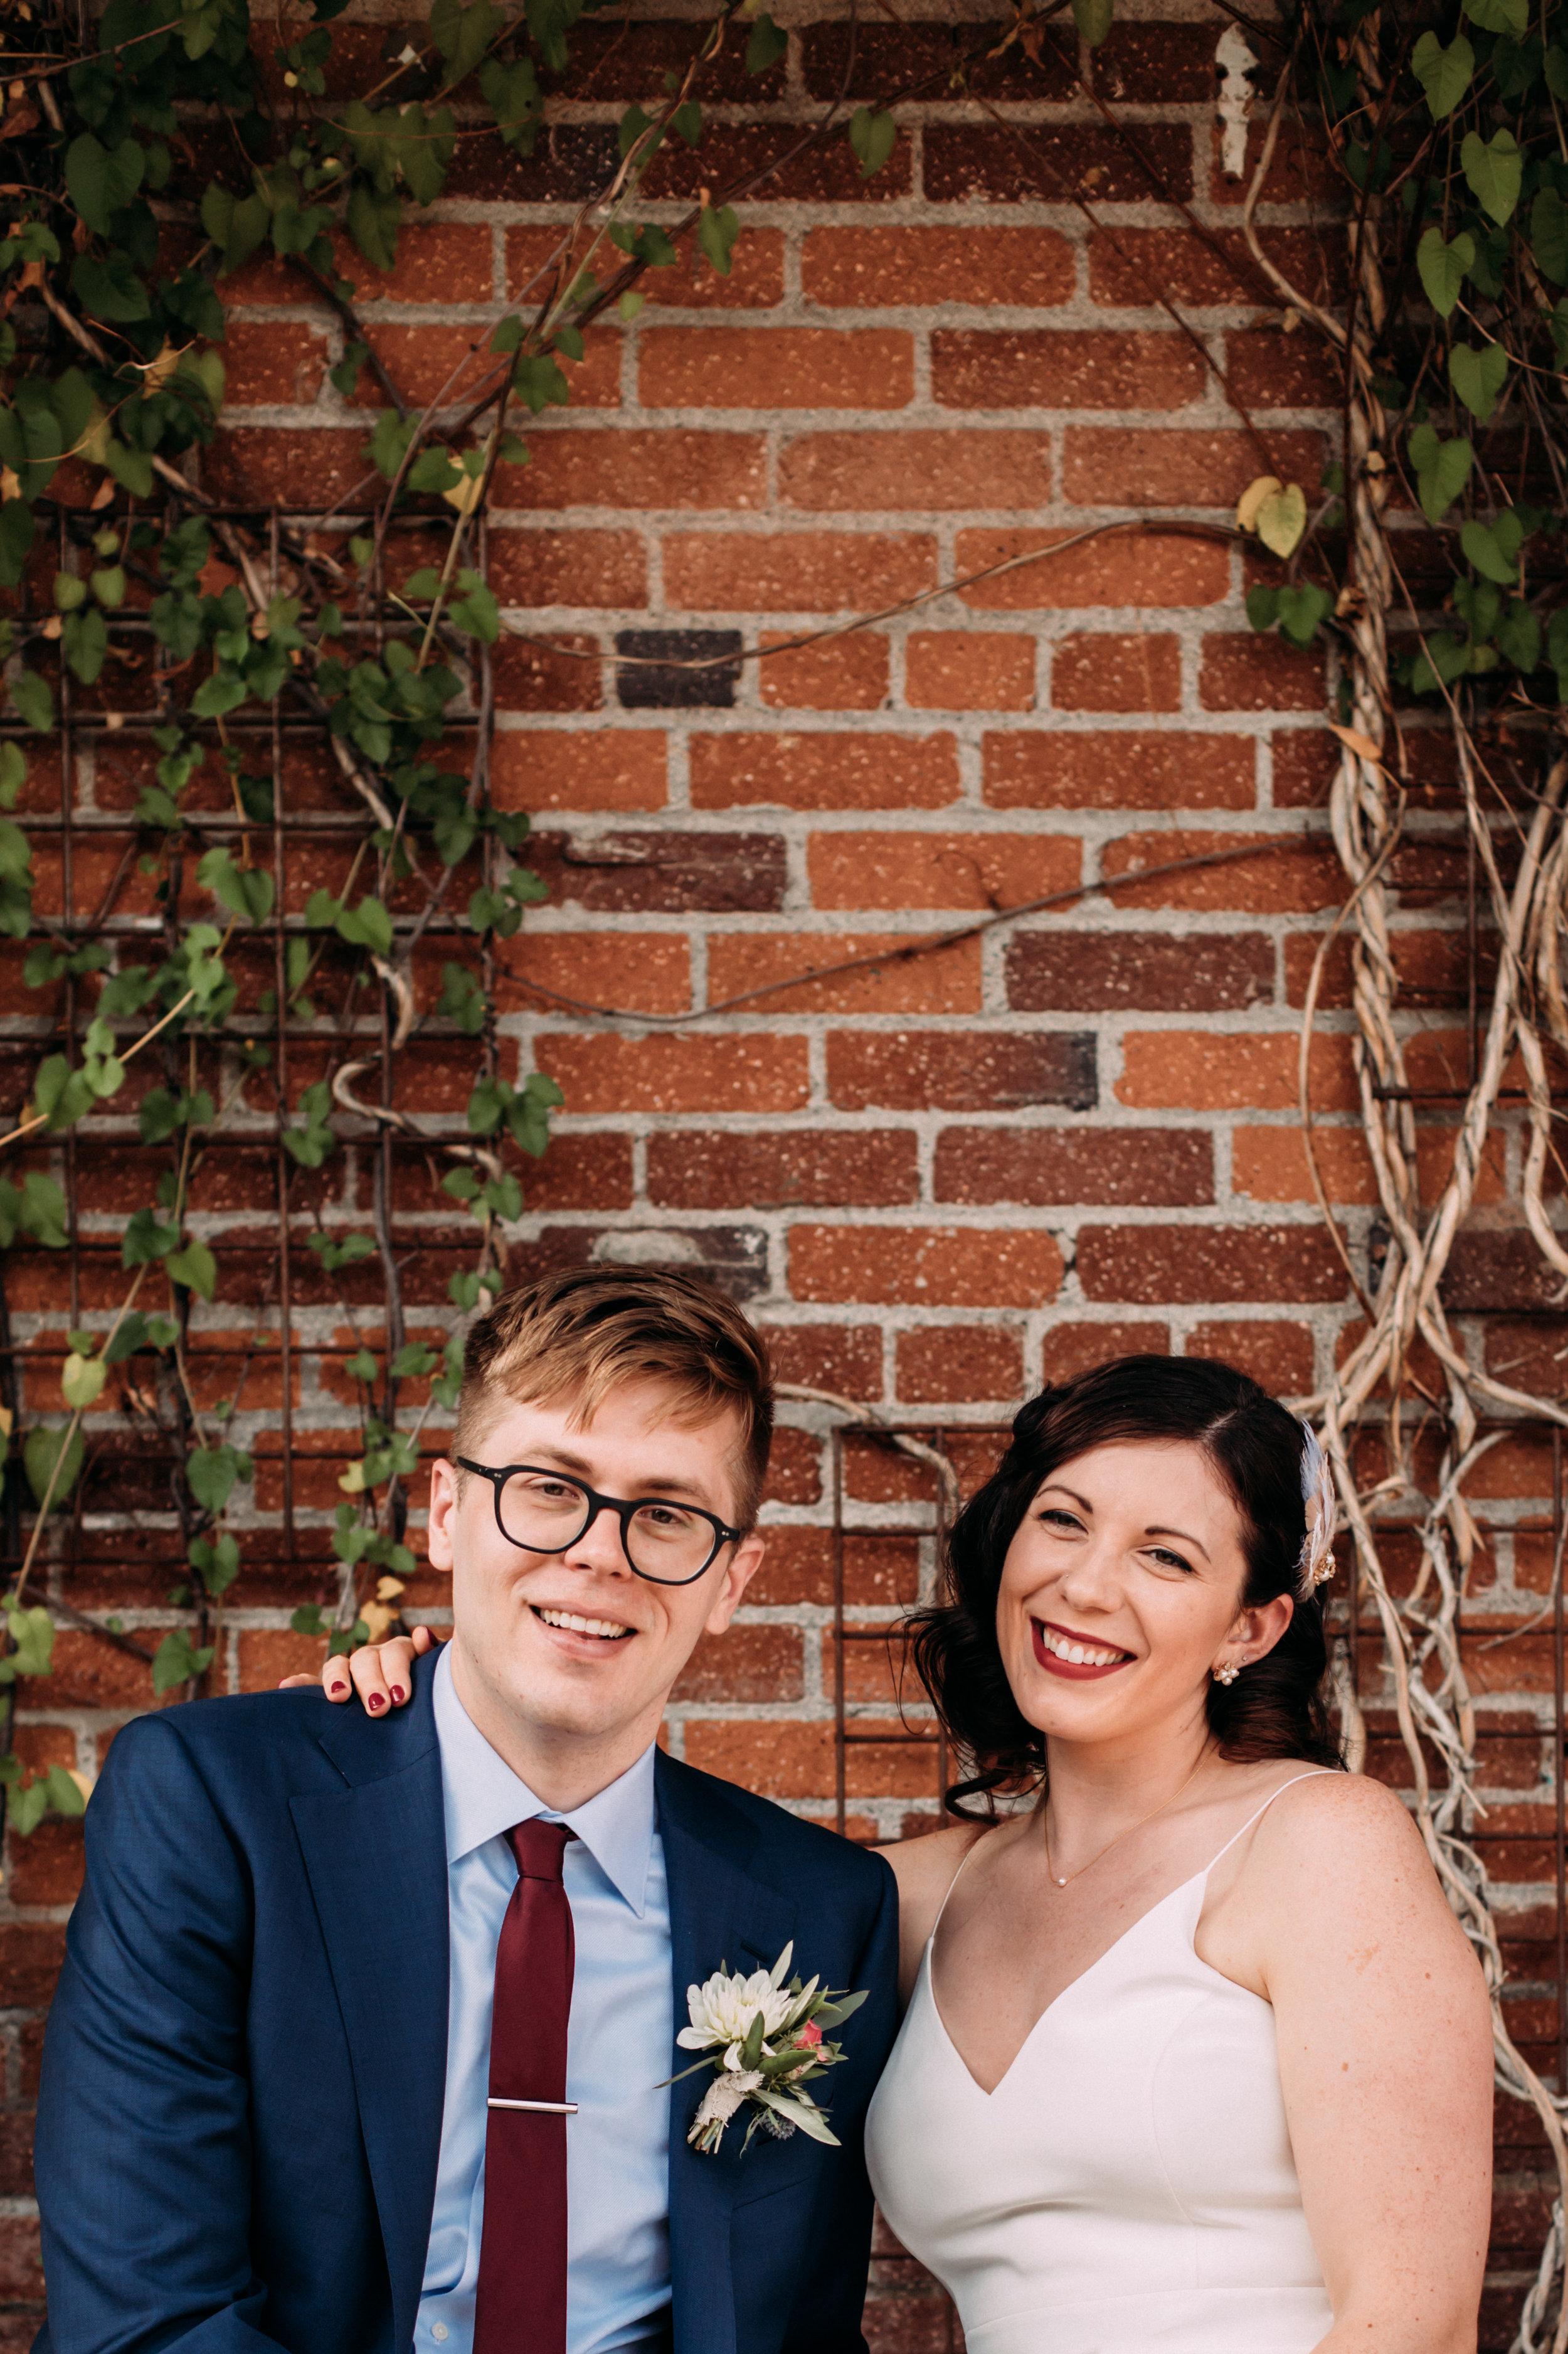 Ellen + Will | Ashlyn Savannah Photo-1.jpg